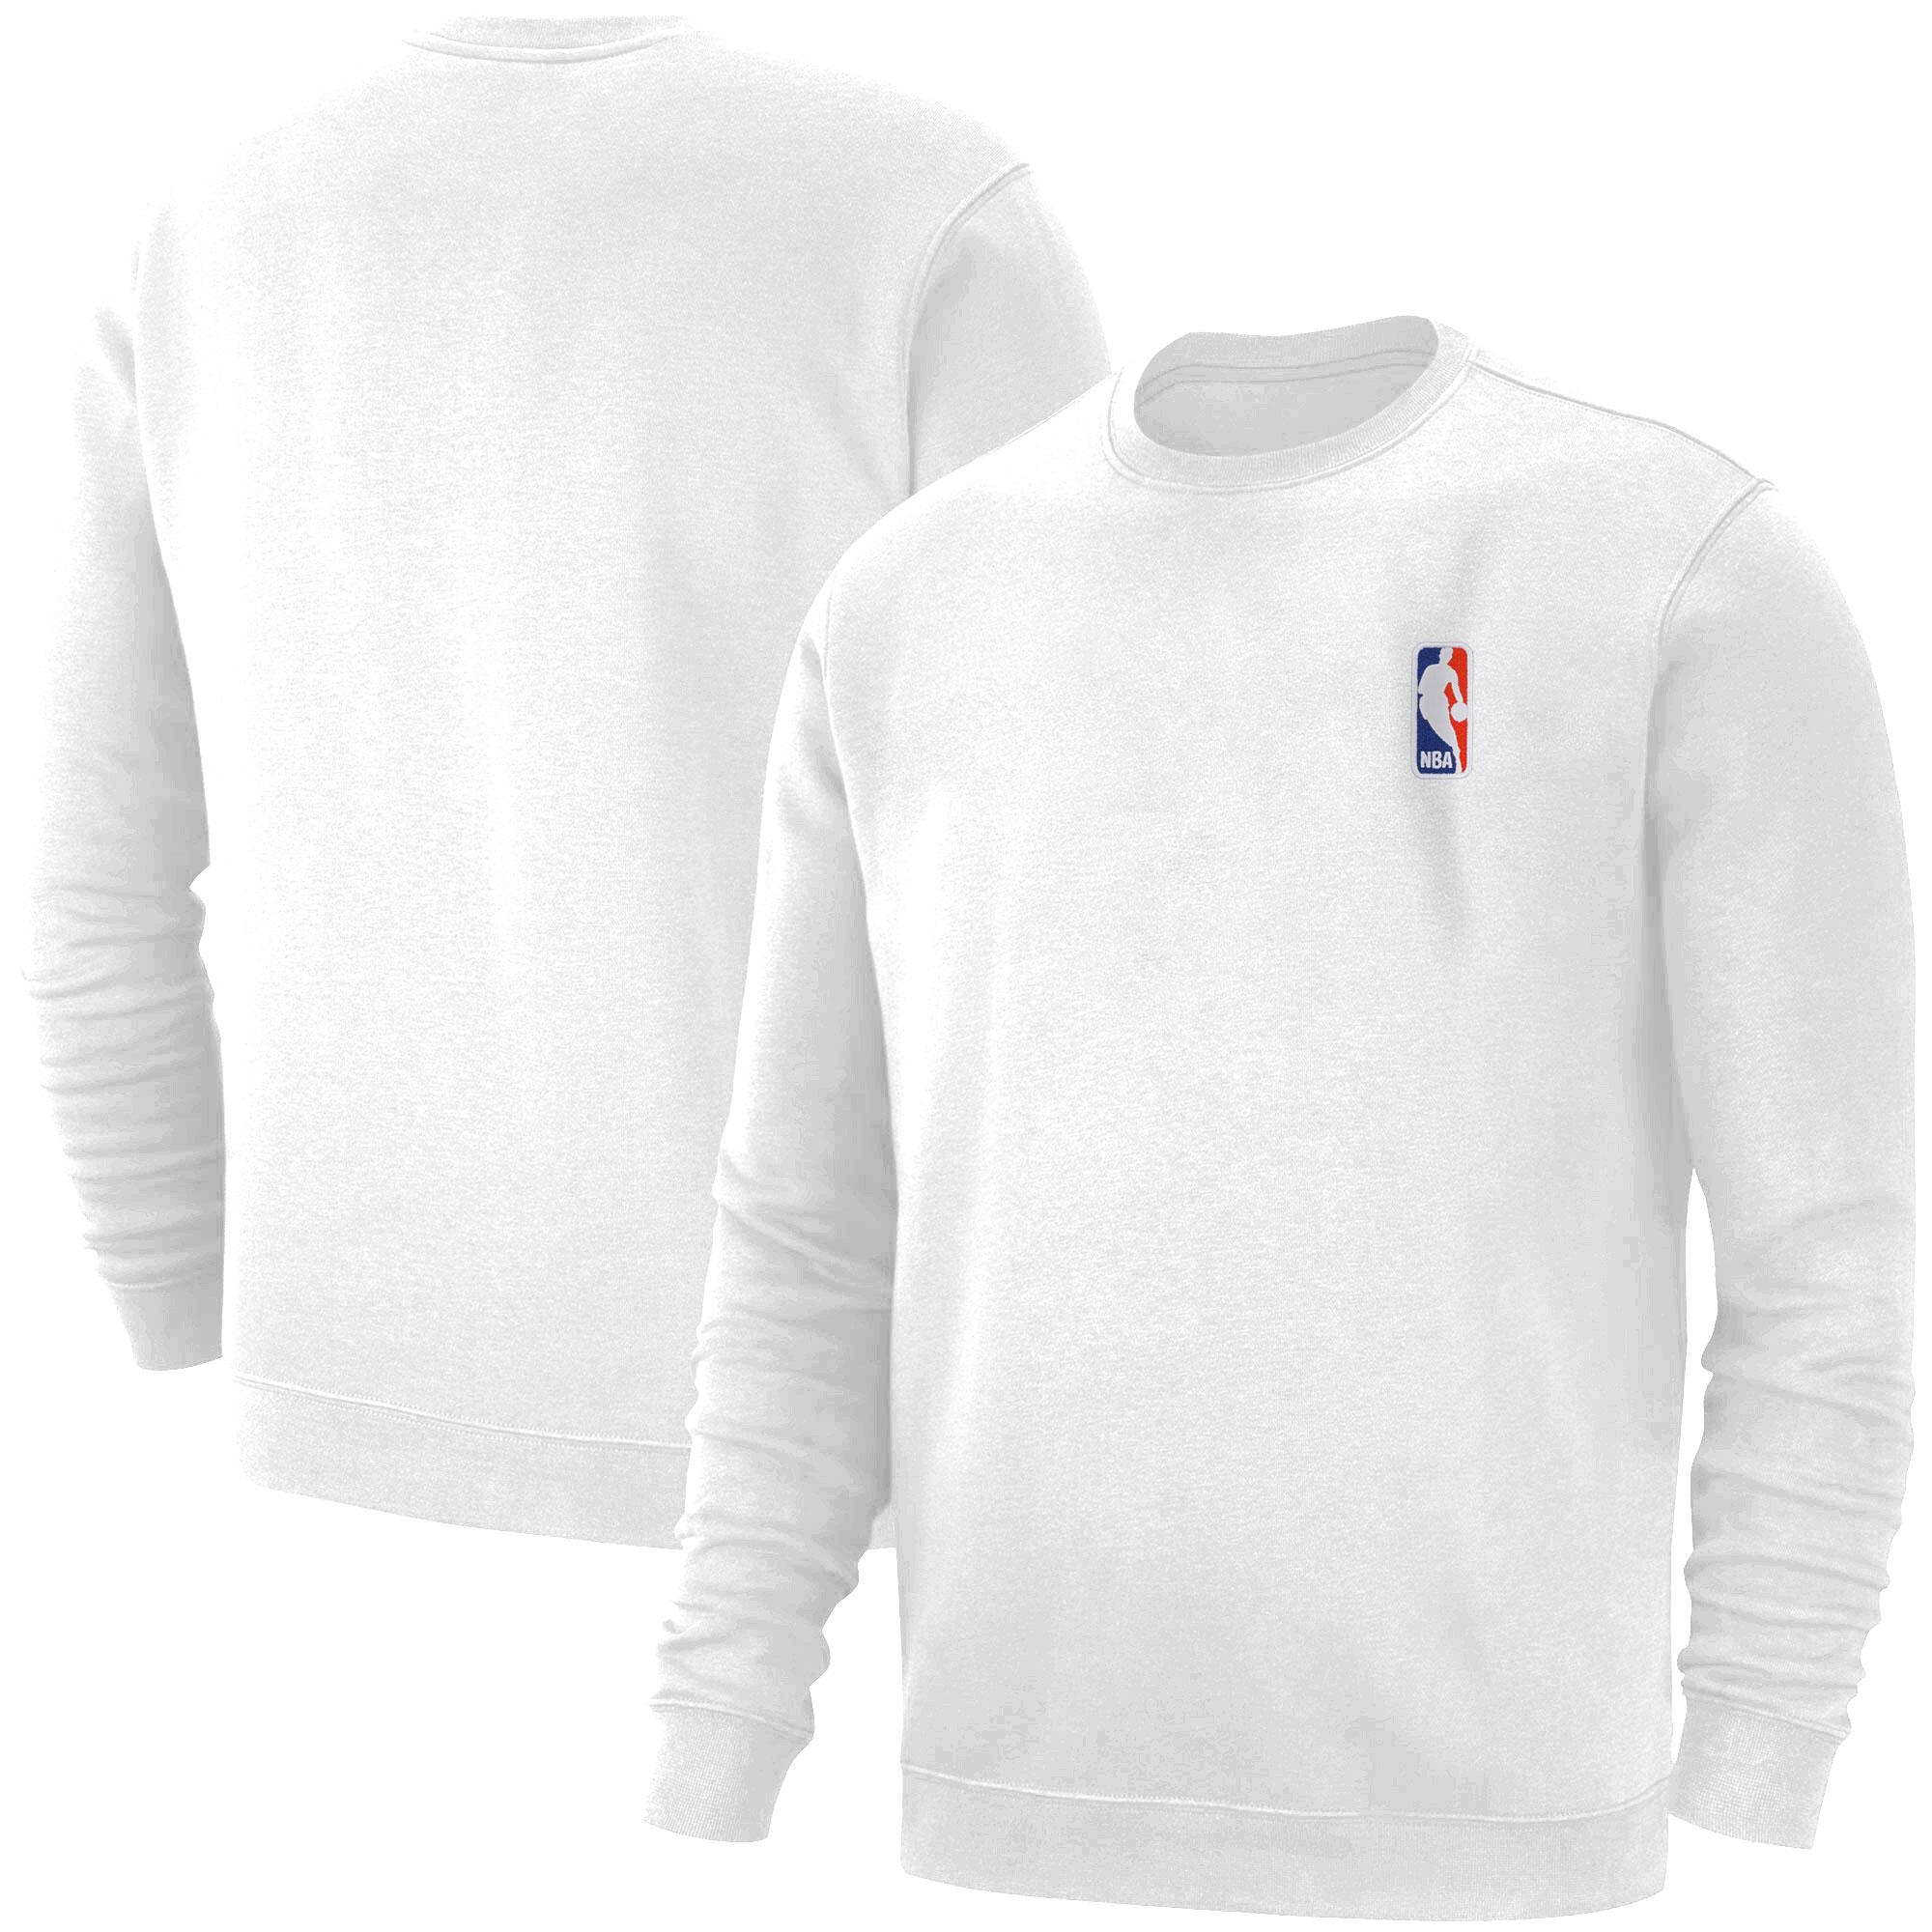 Nba Logo Gear NBA Logo Basic (Örme)  (BSC-RED-EMBR-NBA-LOGO)